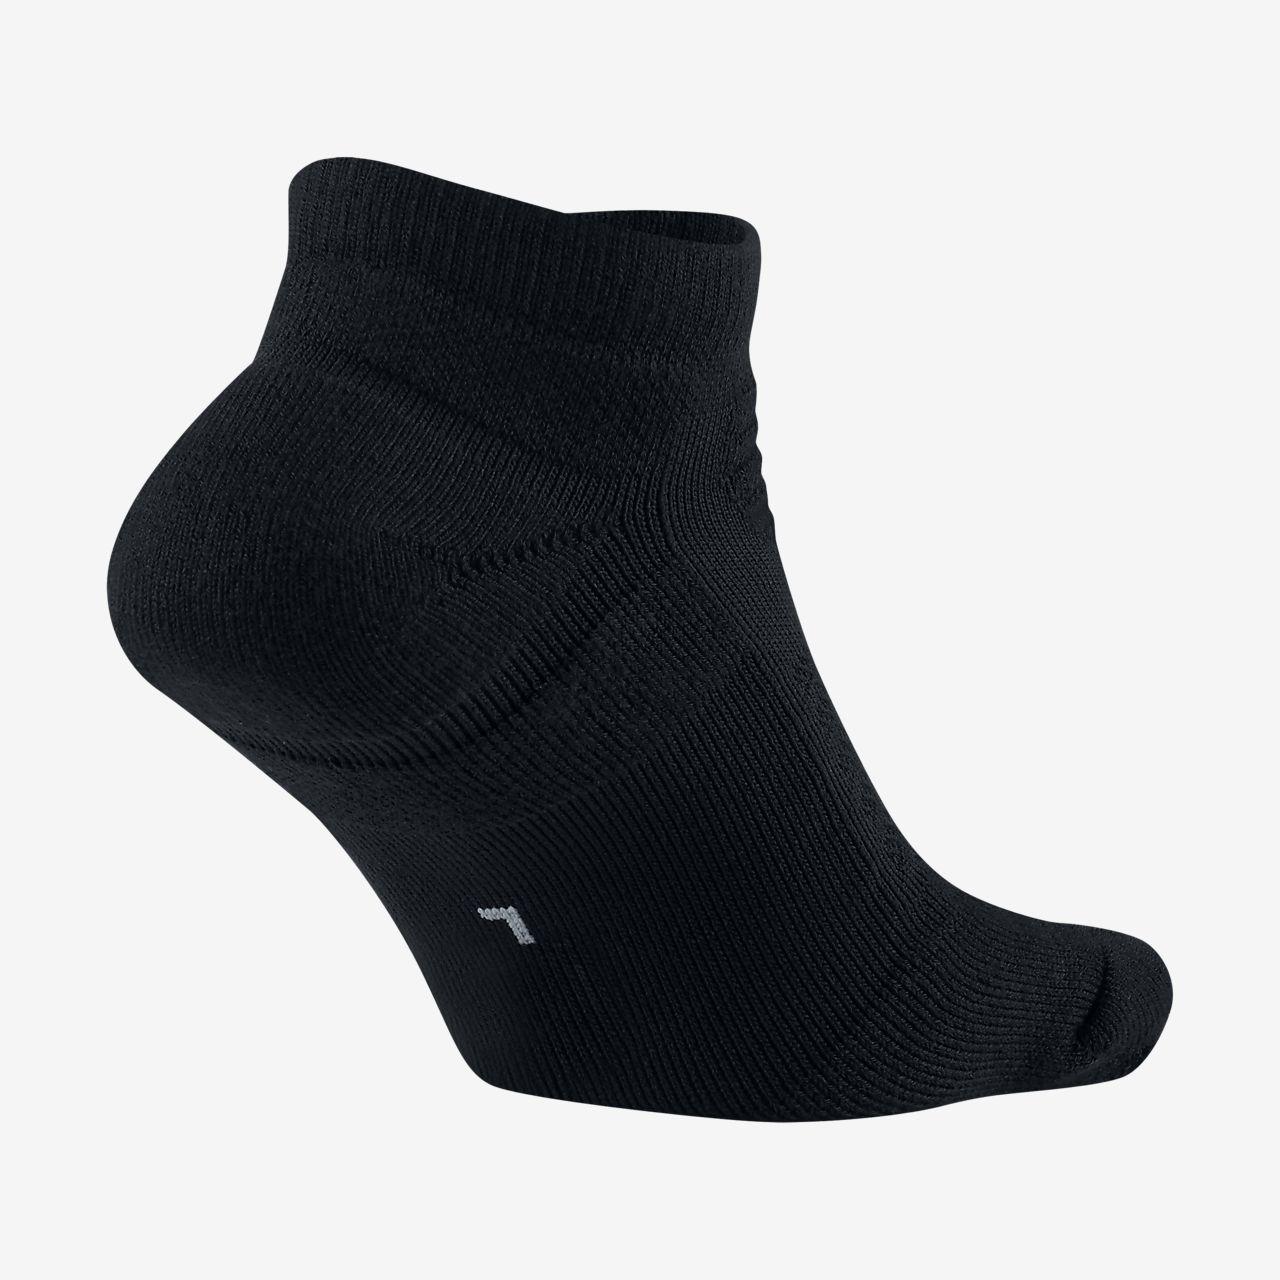 Meias de basquetebol Jordan Dry Flight 2.0 Ankle